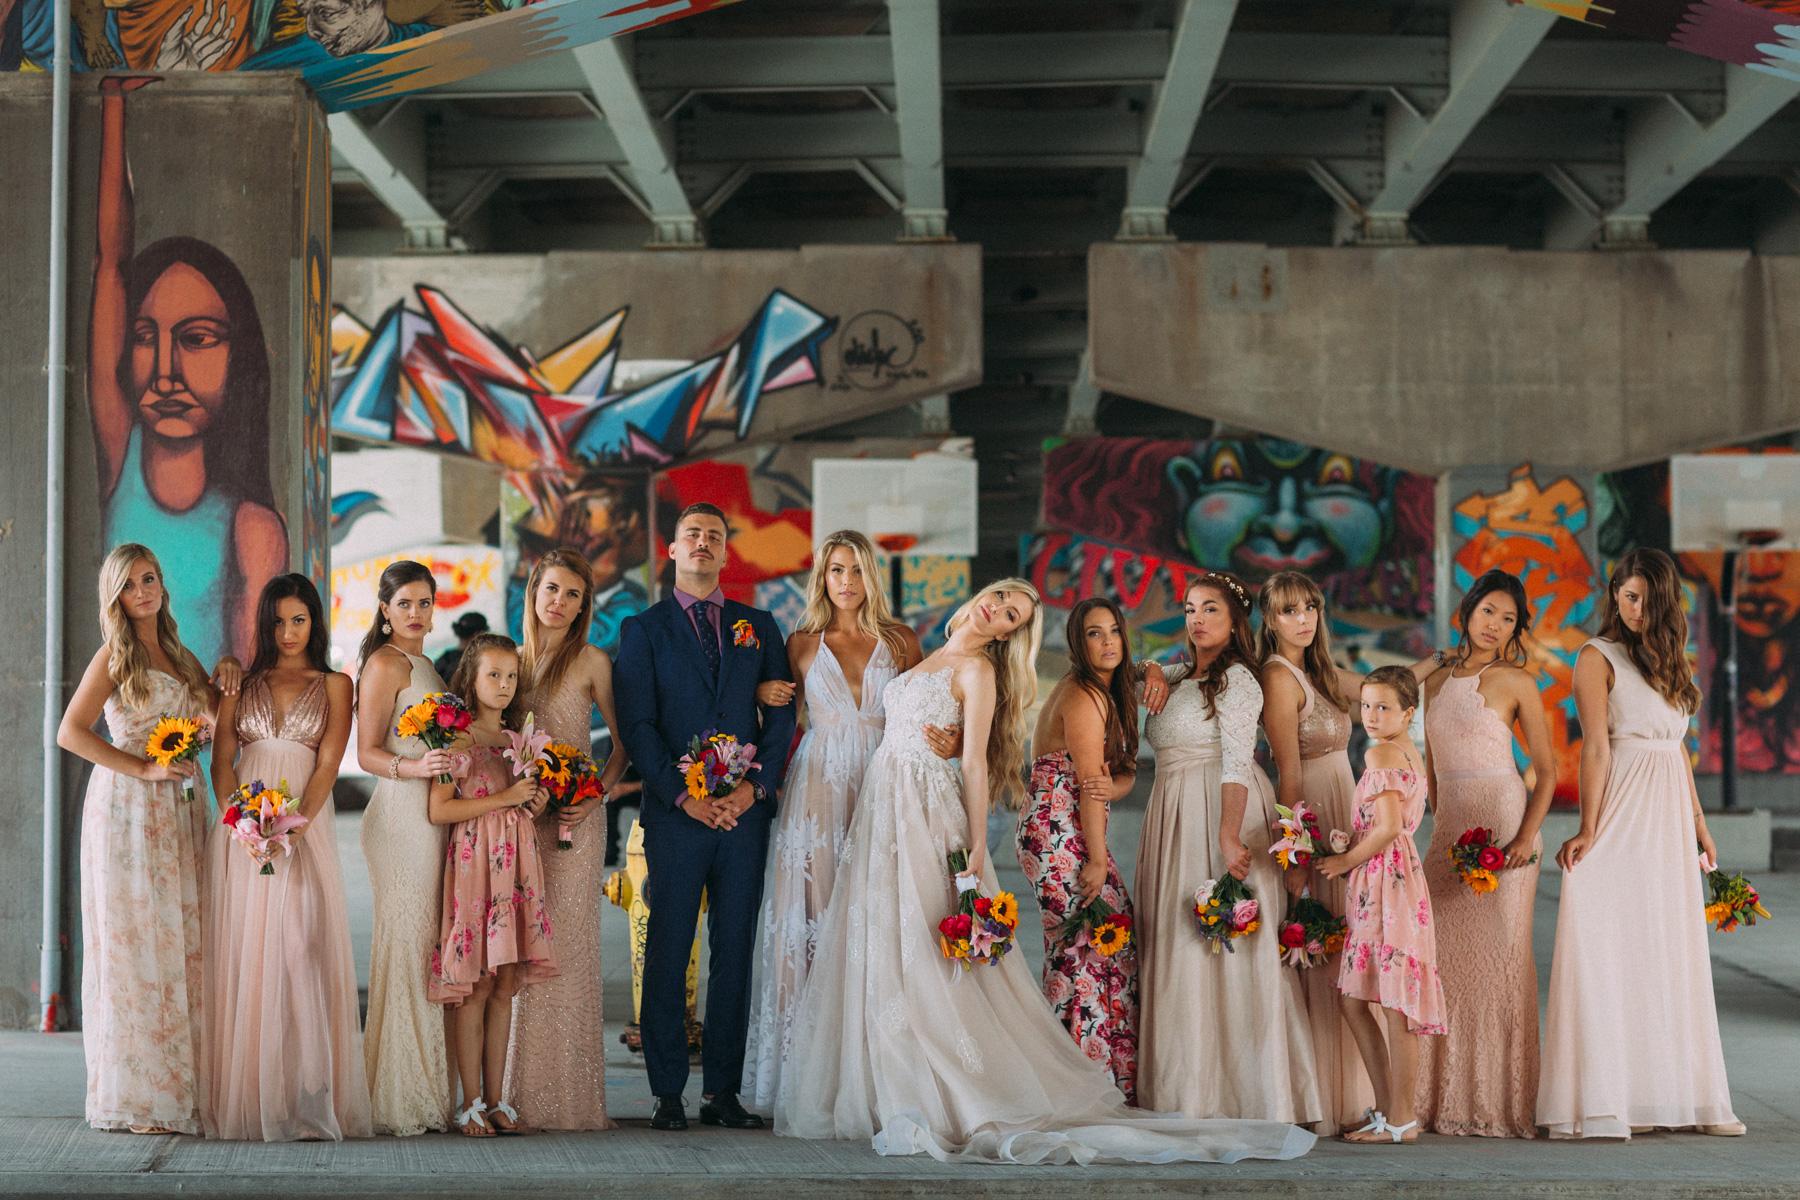 La-Maquette-wedding-by-Toronto-modern-wedding-photographer-Sam-Wong_19.jpg